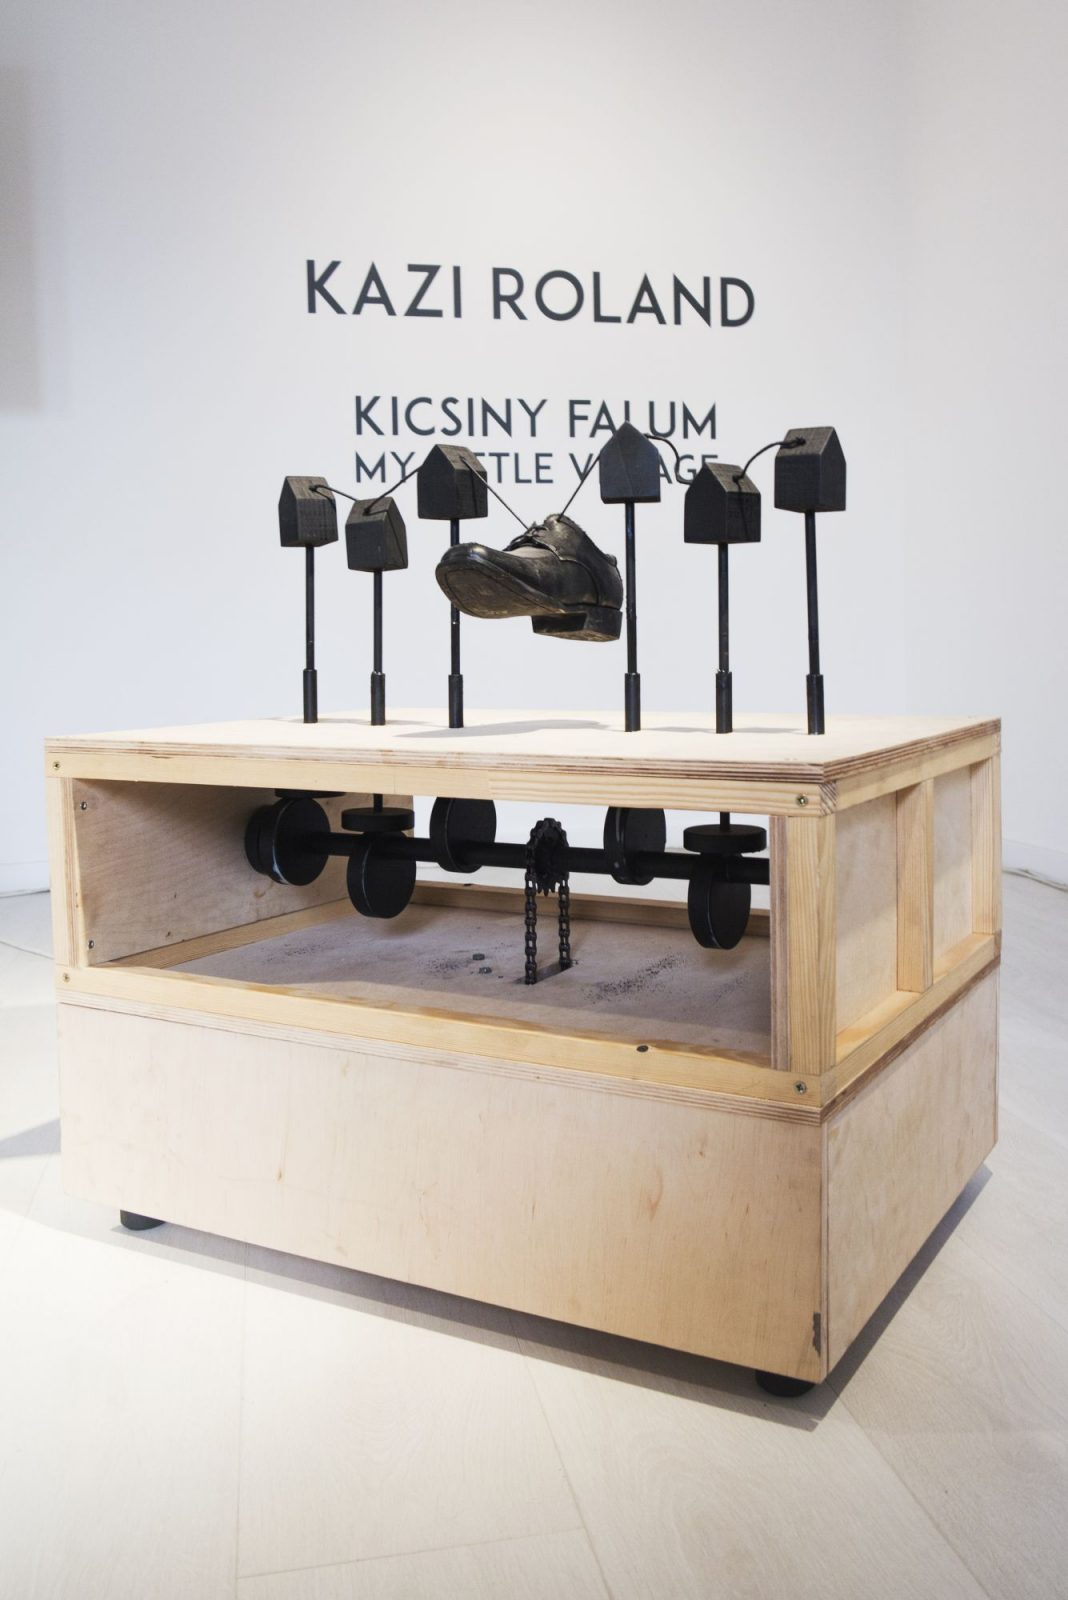 Kazi Roland: Kicsiny falum III.